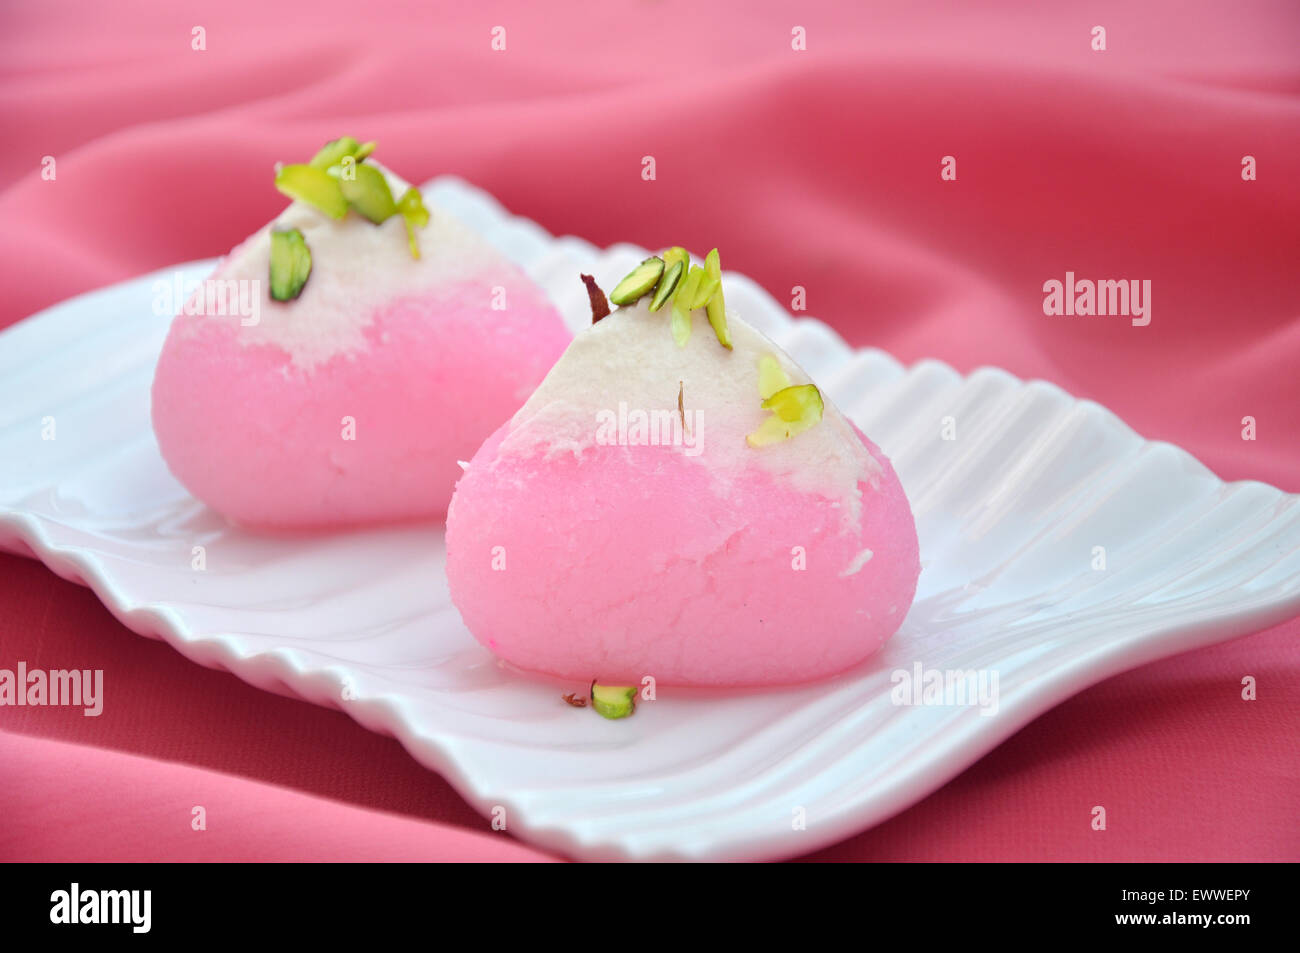 Dilbahar Chum Chum Closeup - Stock Image